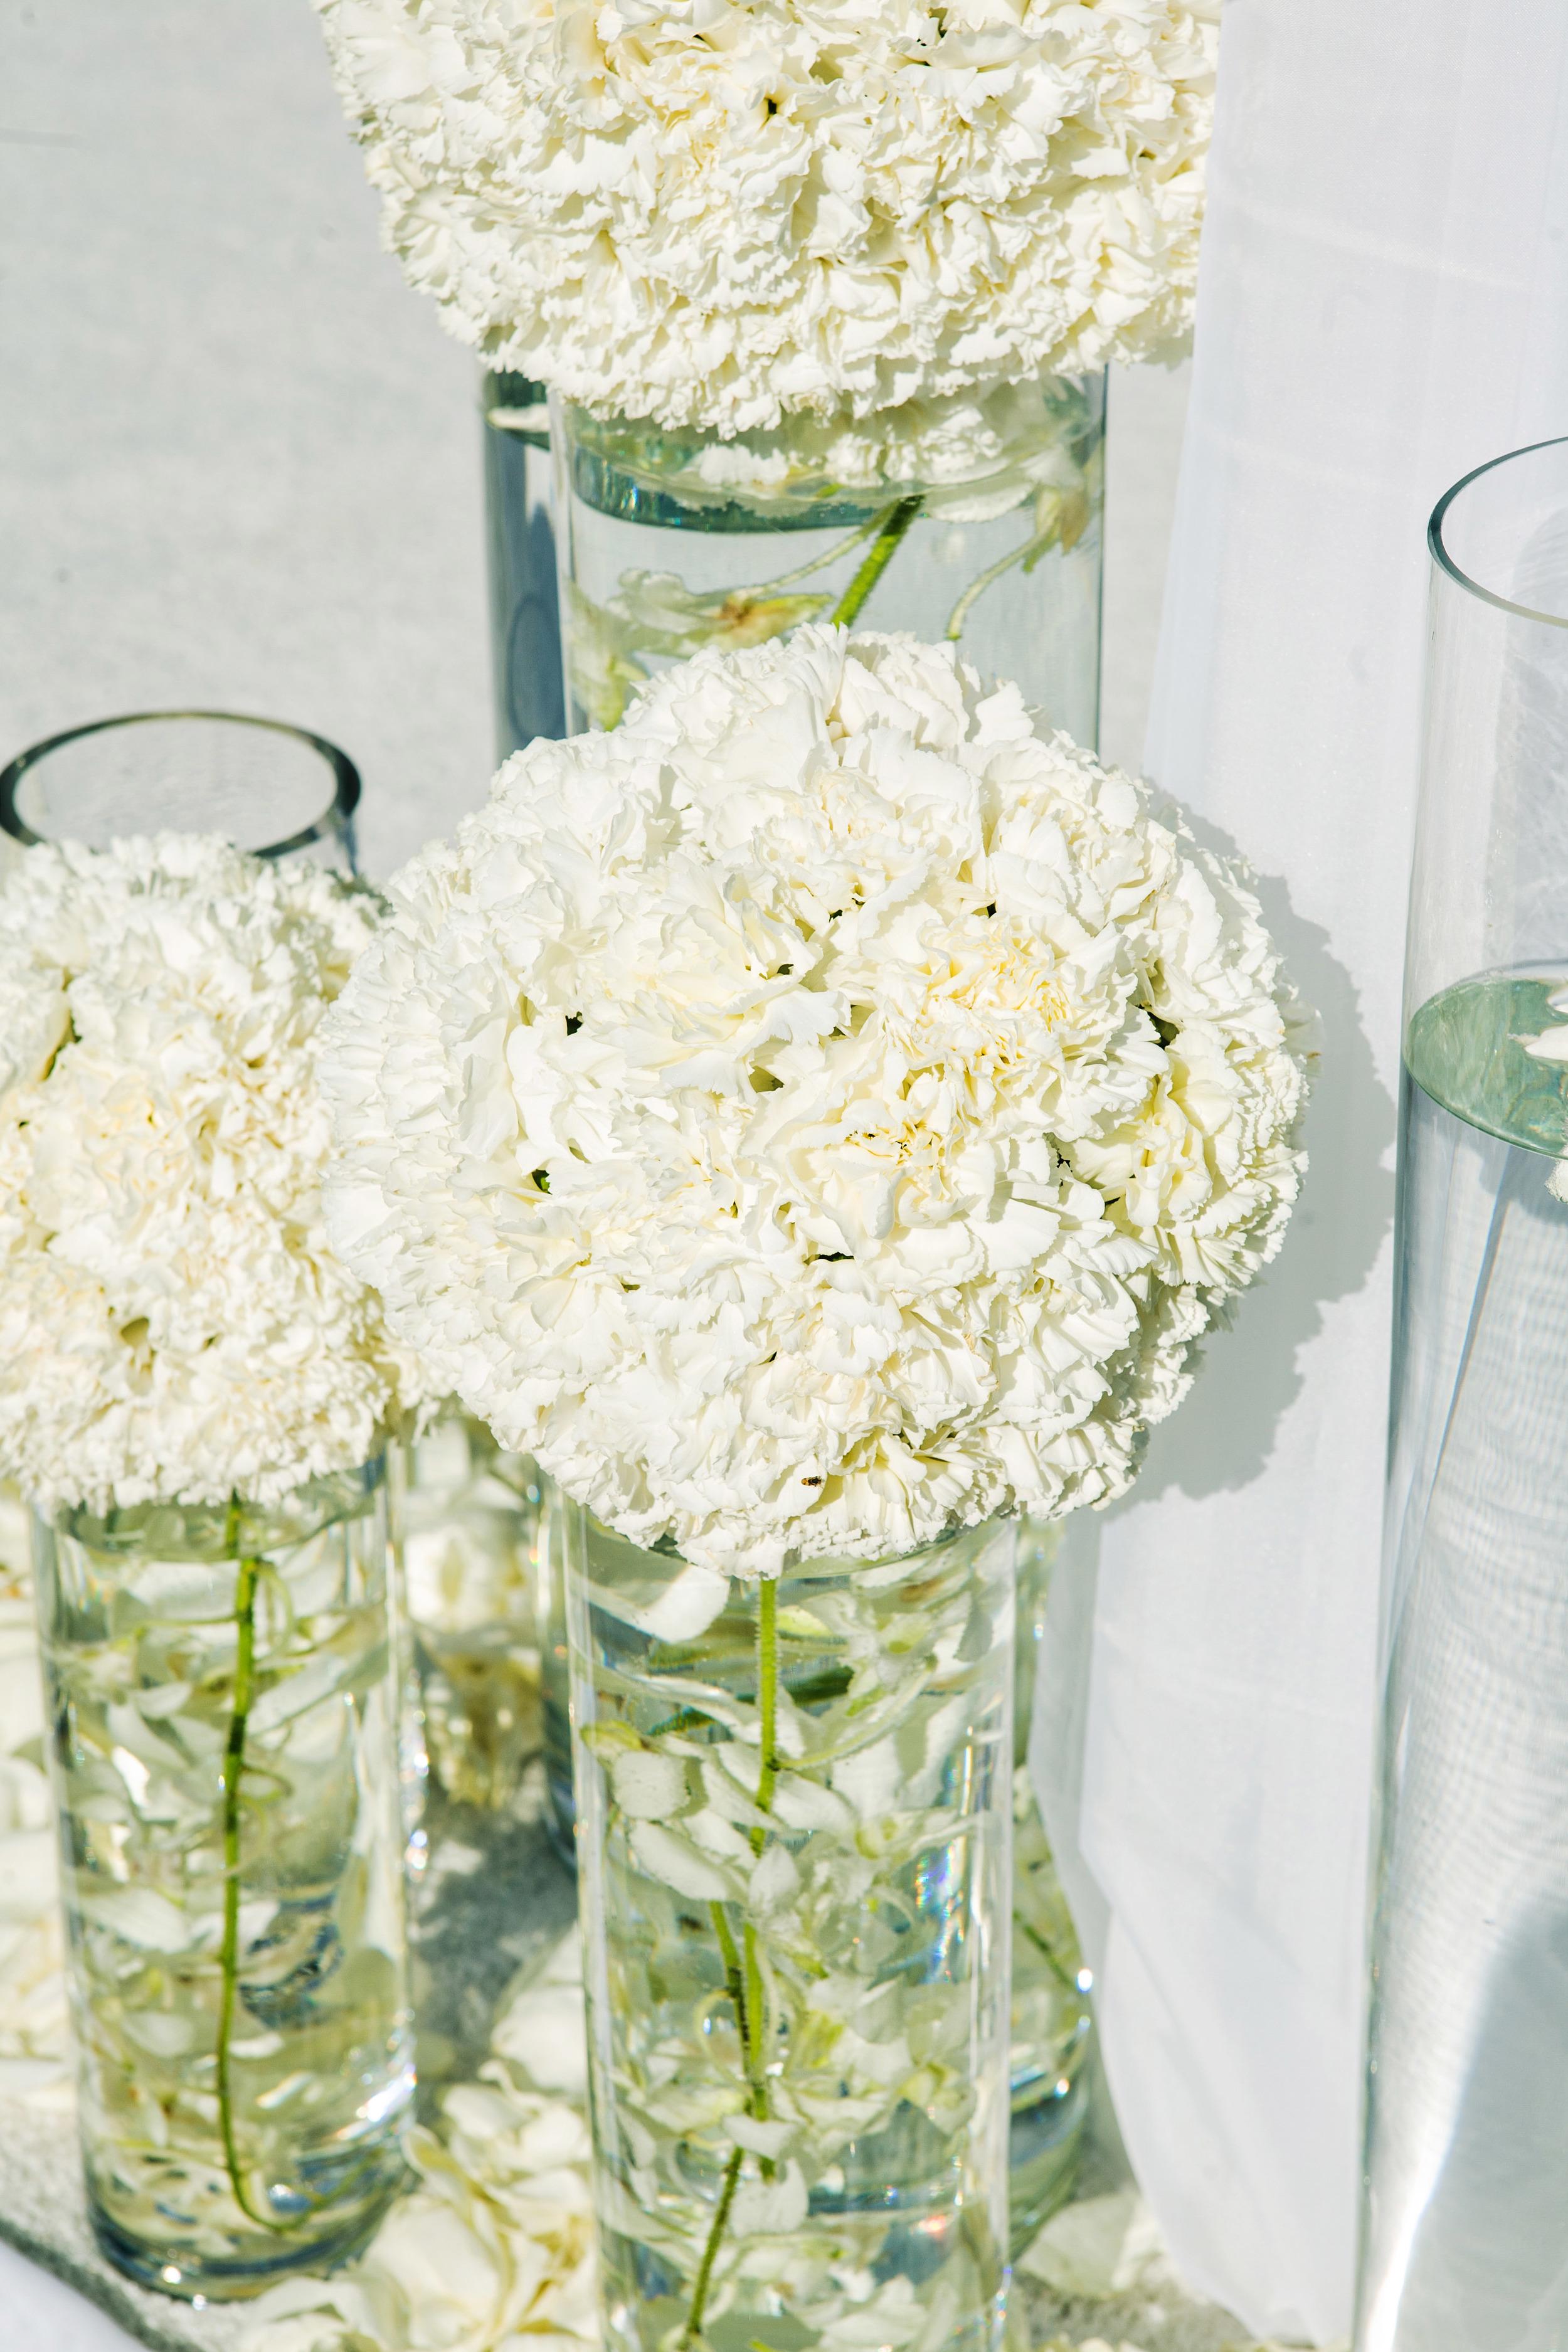 05. LS - Pomenader balls, submerged orchids, chuppah flowers, ceremony decor, napa wedding, vineyard ceremony .jpg